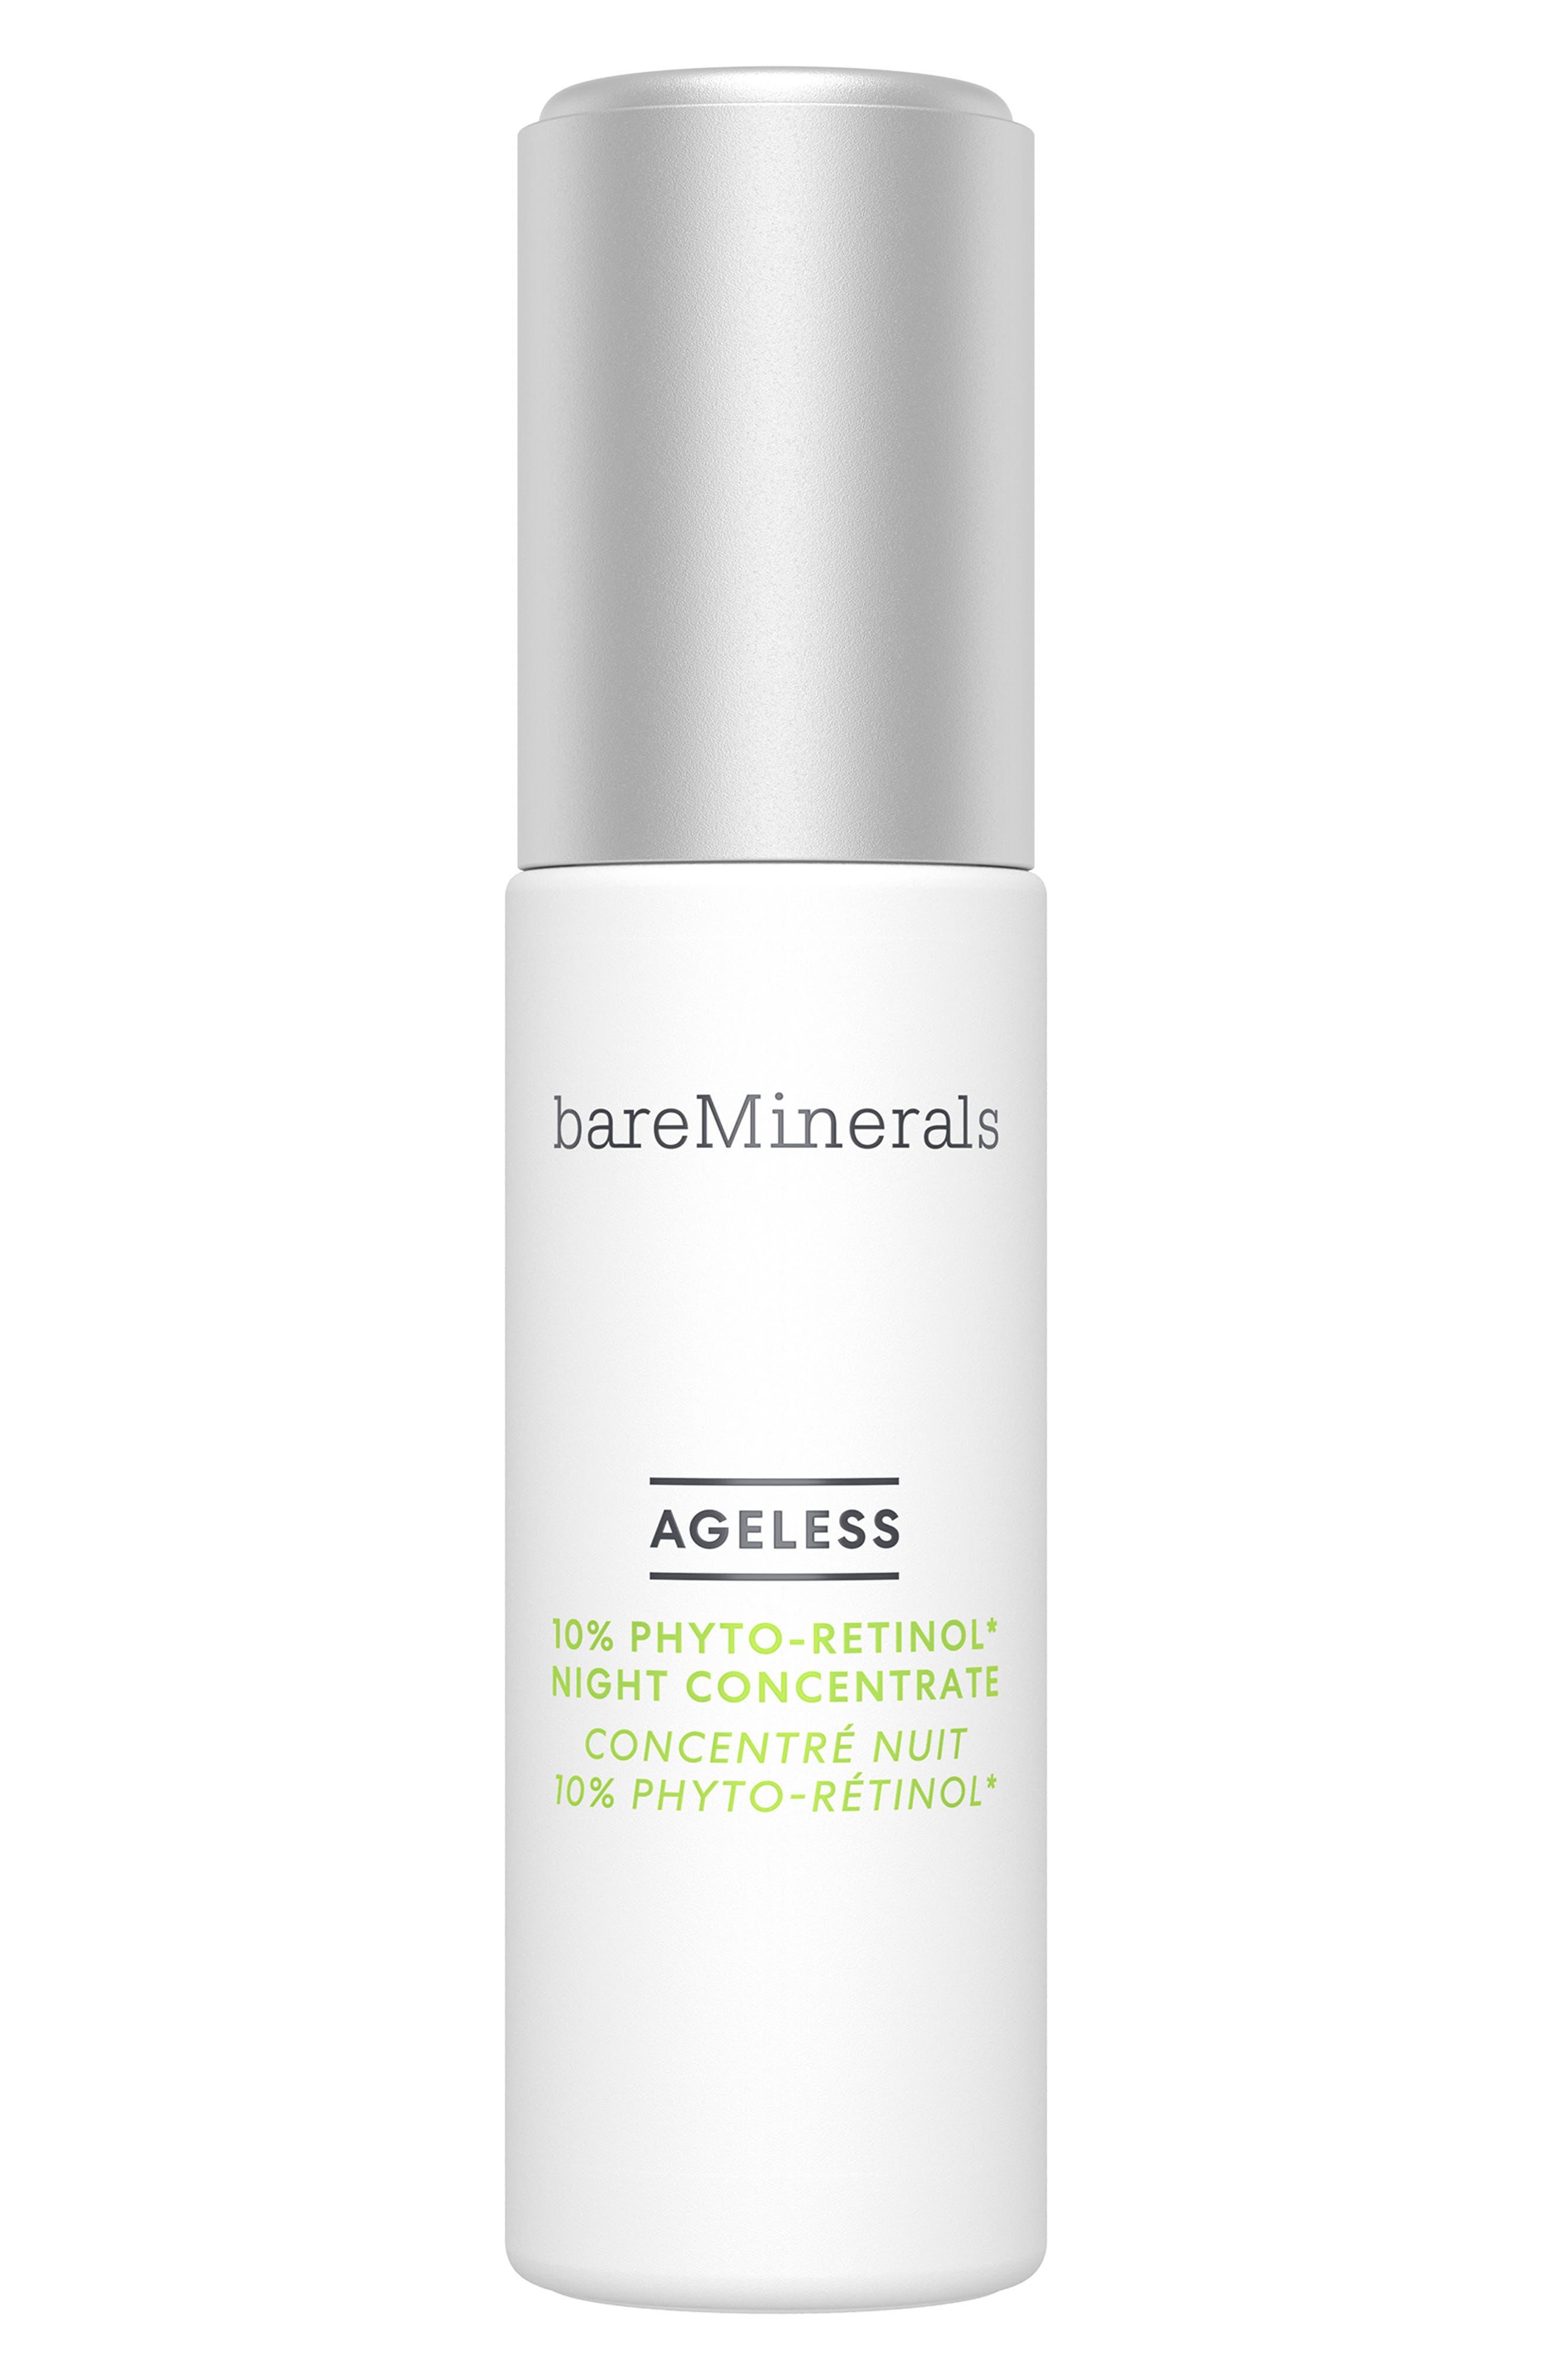 Bareminerals Ageless Phyto-Retinol Night Concentrate